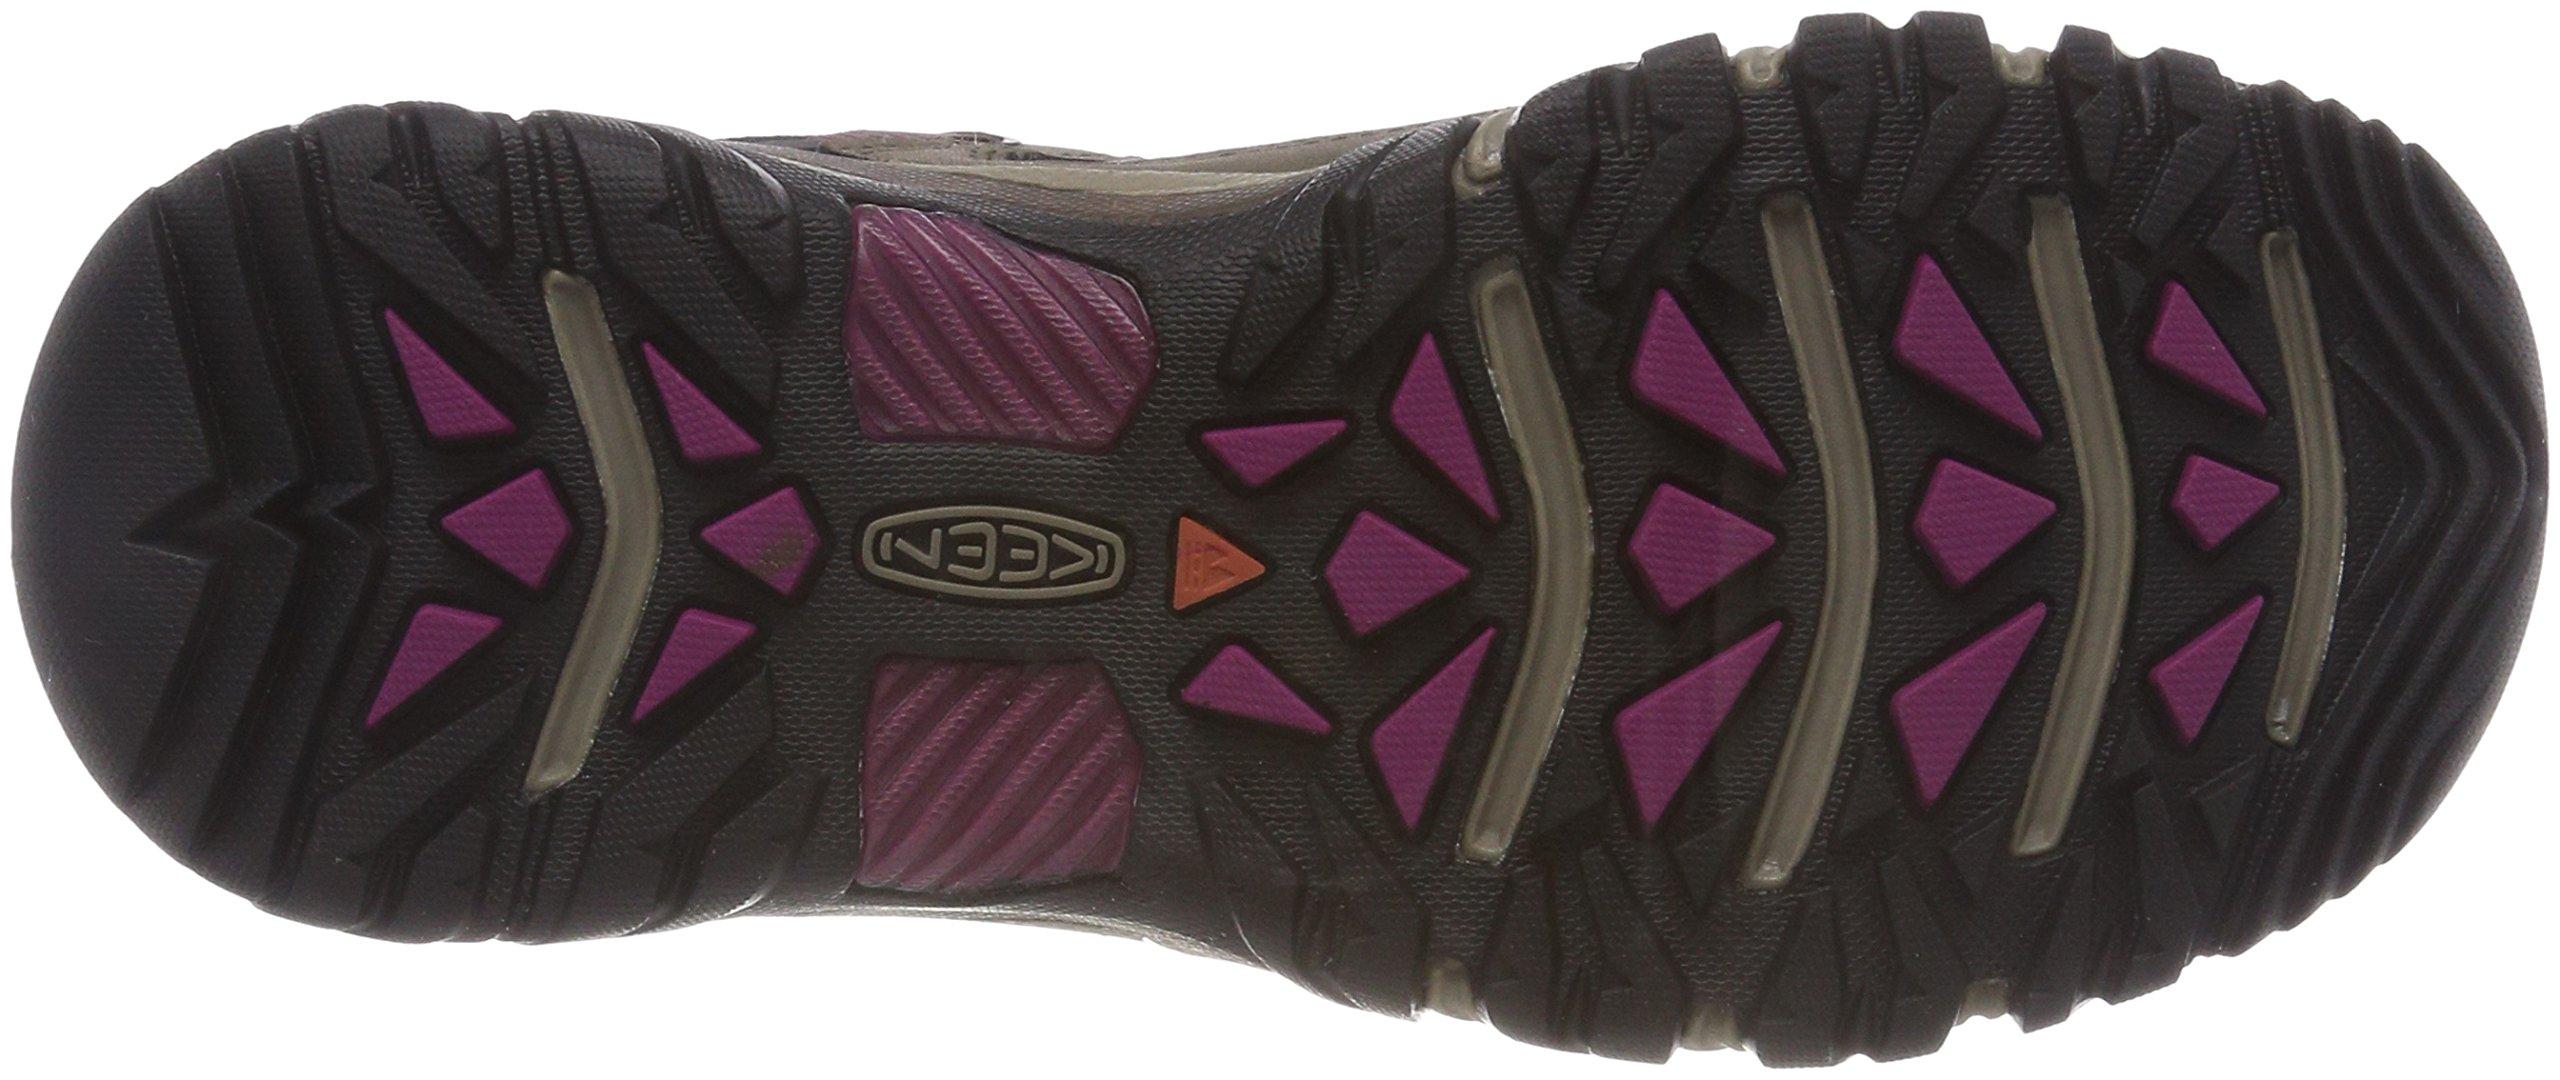 81G1NJQ7y8L - KEEN Women's Targhee Iii Wp Low Rise Hiking Shoes, 9